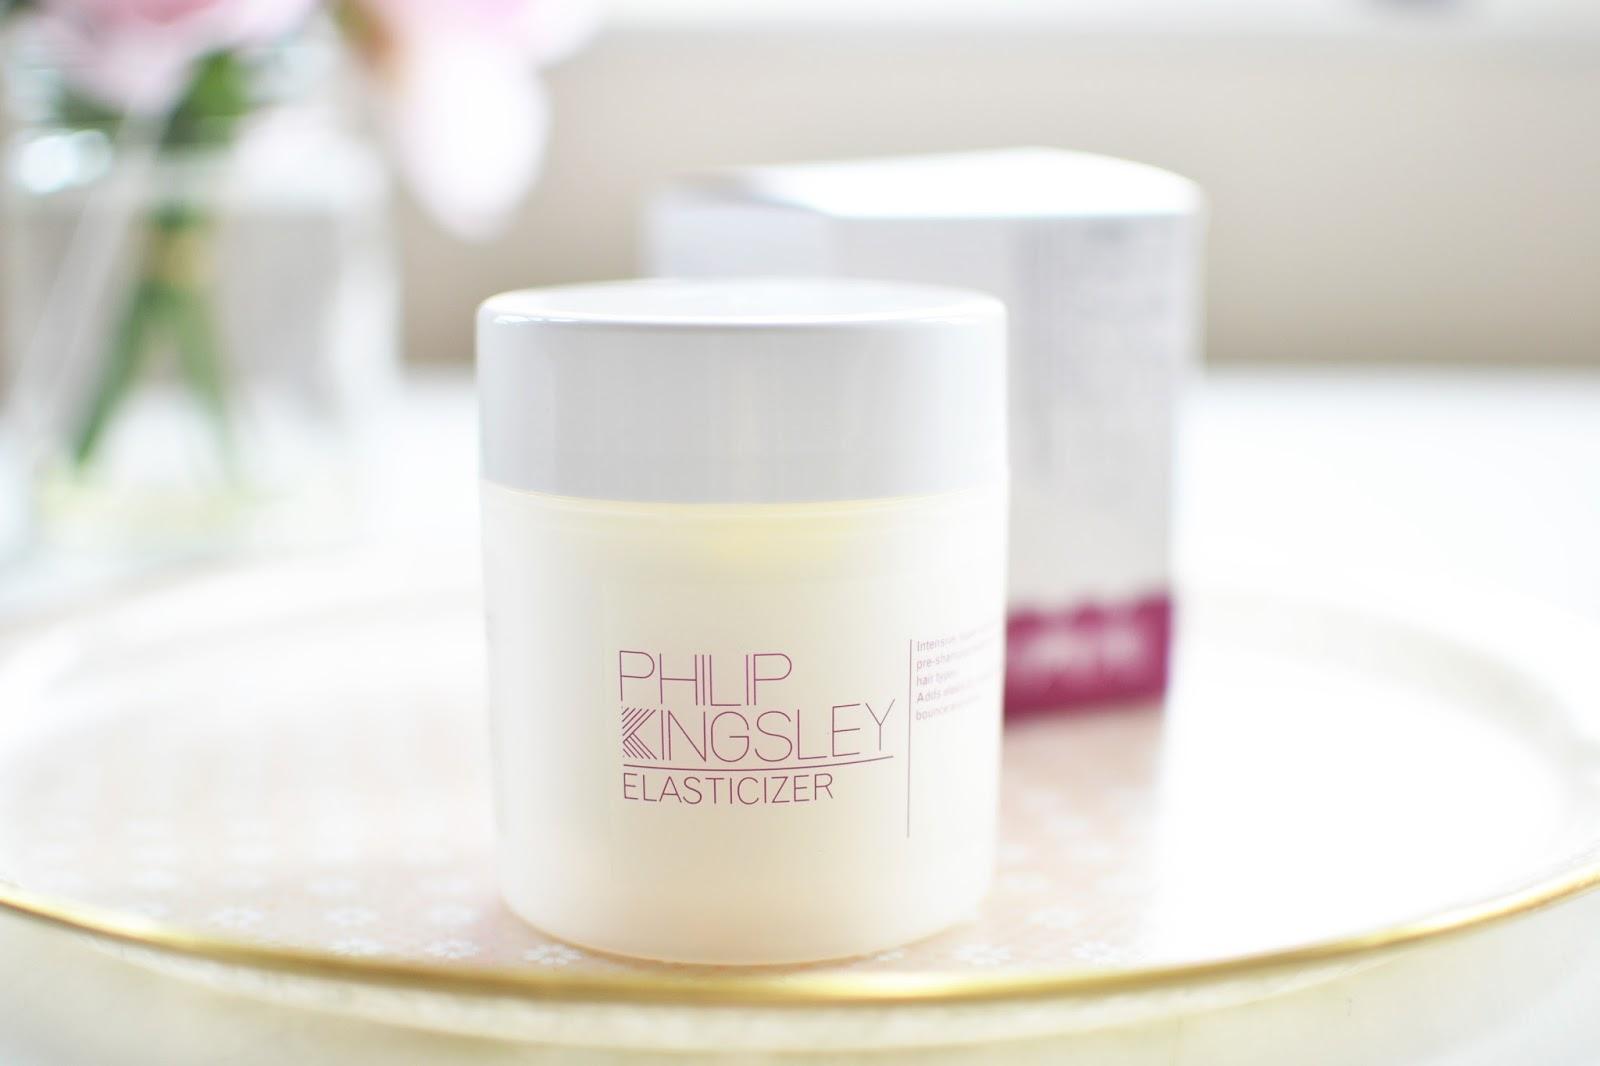 Philip kingsley samples